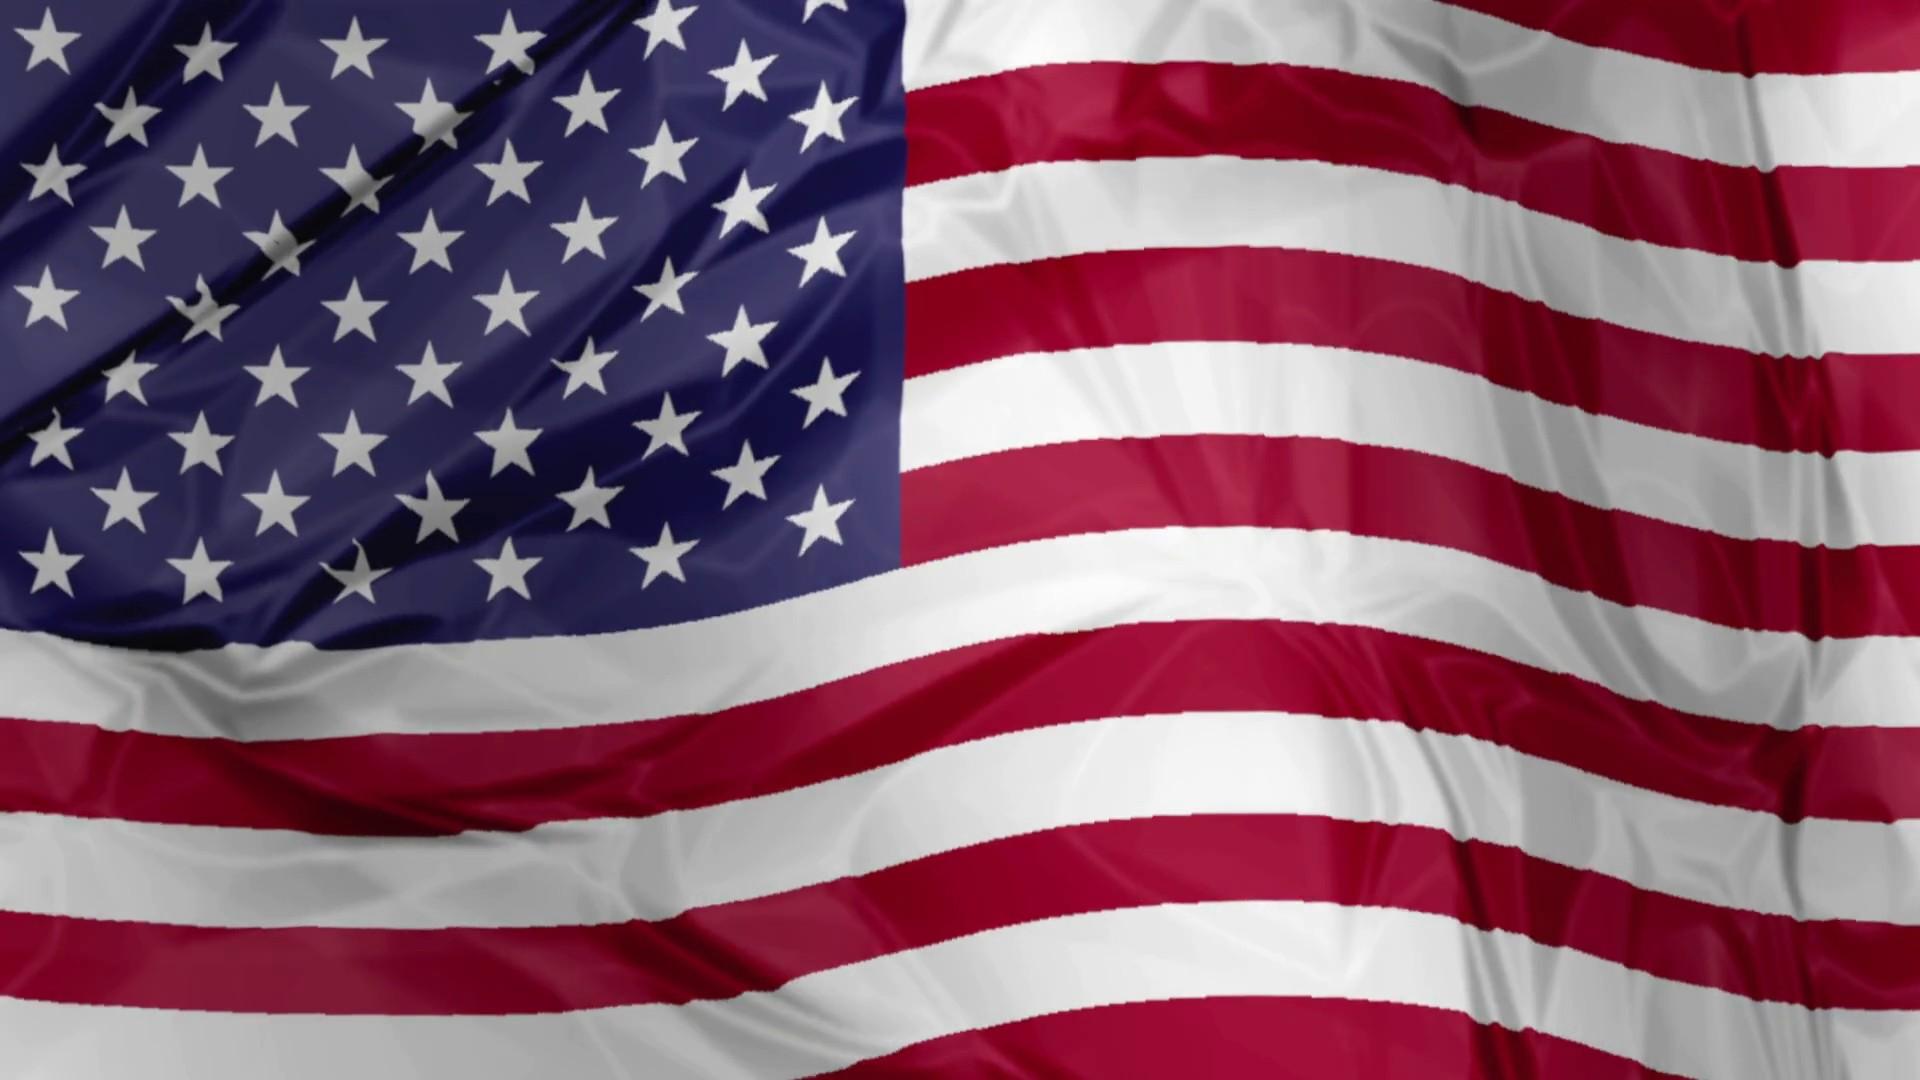 Freddy Krueger Wallpaper 3d American Background 183 ① Download Free Amazing Hd